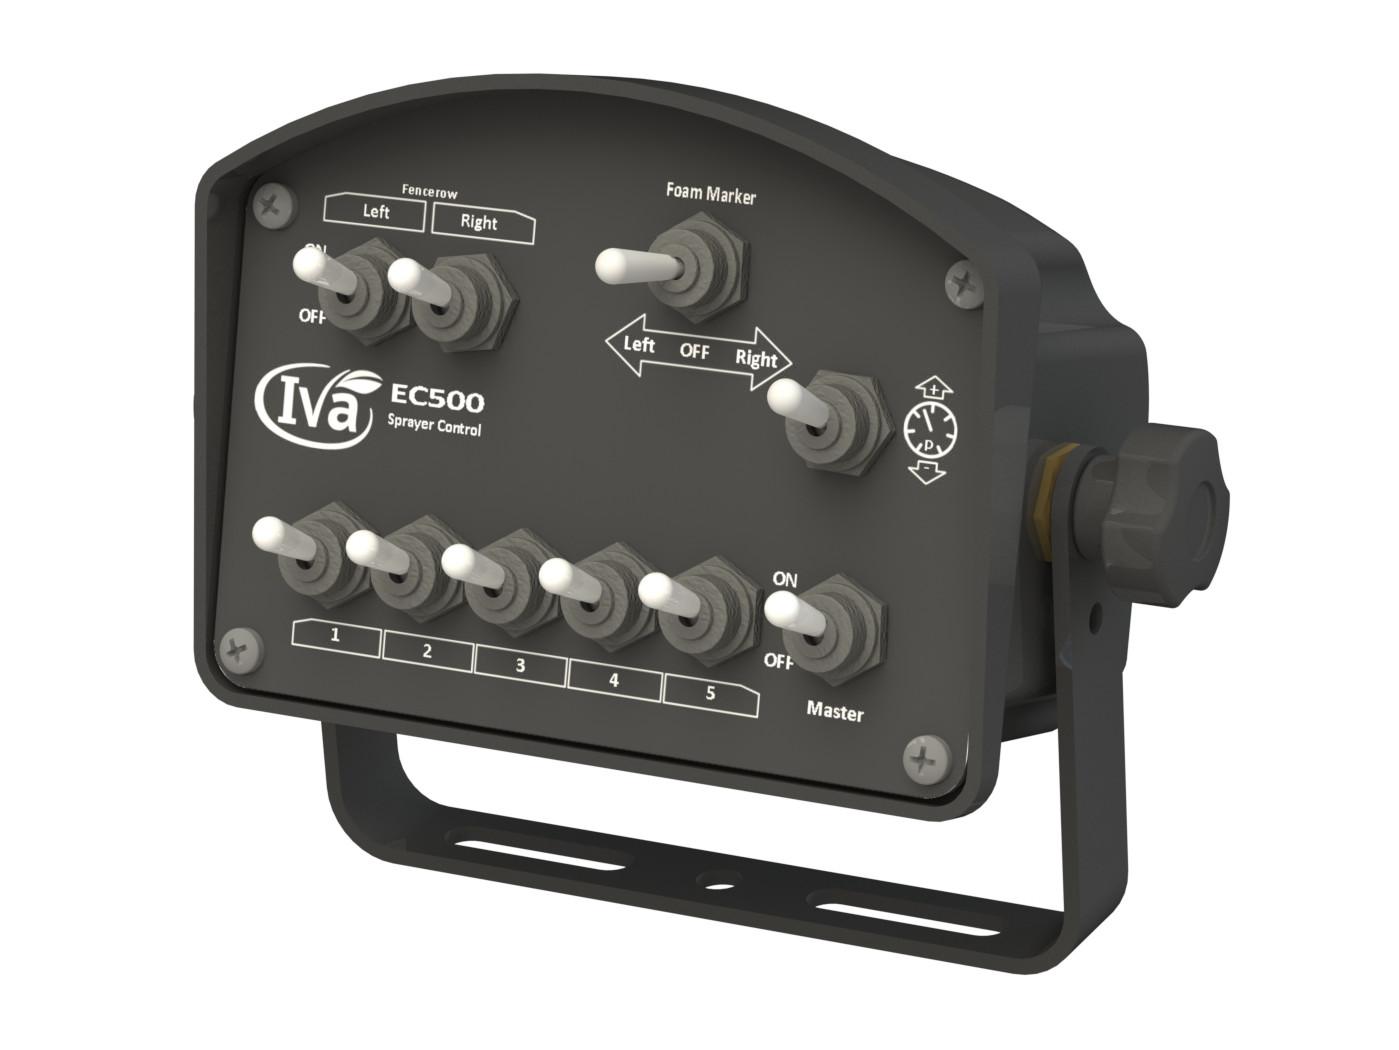 EC530 Iva electric control